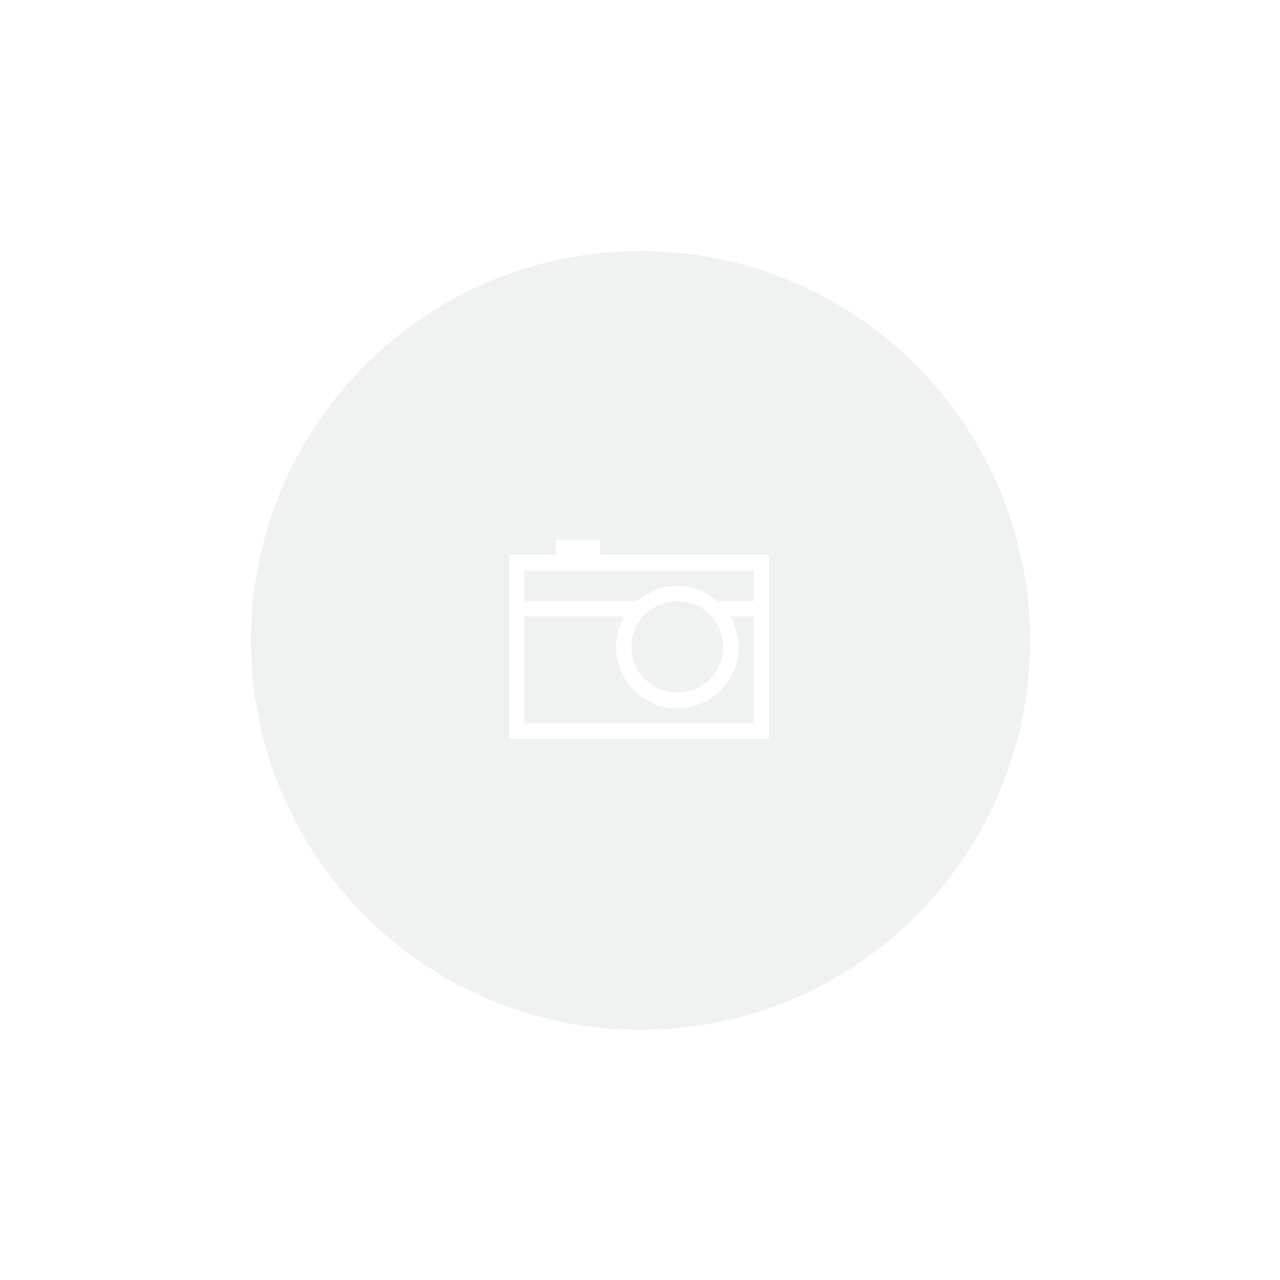 Papel Artesanal Indiano - Ref. 34